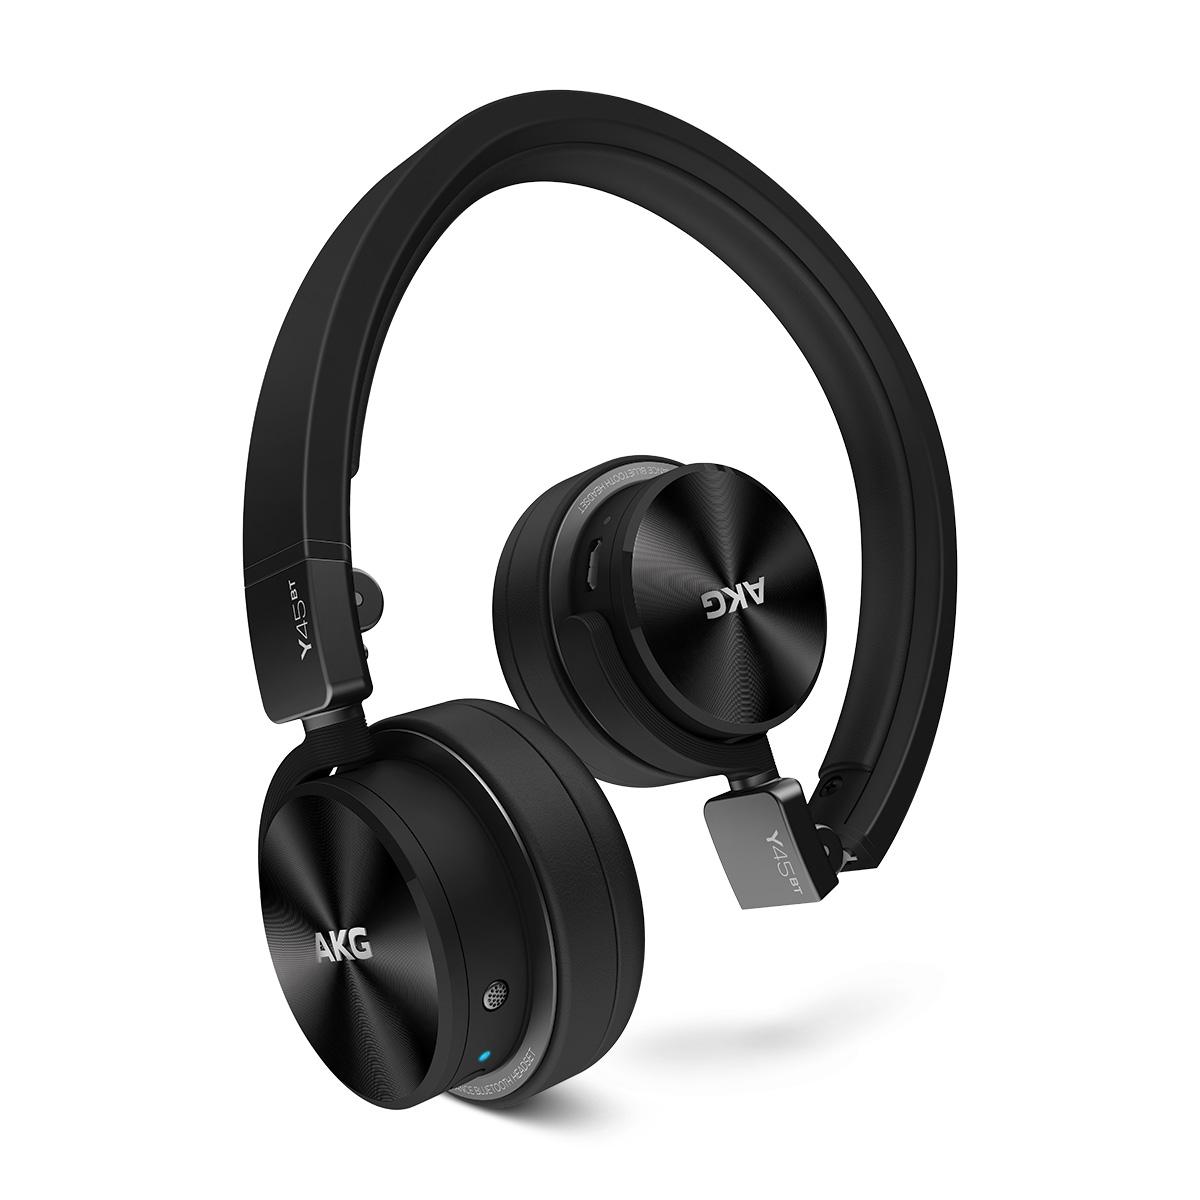 Powieksz do pelnego rozmiaru y40, y-40, y - 40, y 40, słuchawki przenośne, słuchawki do iPod, słuchawki do iPad, słuchawki do iPhone, słuchawki do MP3, słuchawki do odtwarzacza MP3, słuchawki do odtwarzaczy MP3, słuchawki zamknięte, słuchawki z pałąkiem, słuchawki nagłowne, słuchawki nauszne, słuchawki podróżne, słuchawki składane, słuchawki przenośne bezprzewodowe, słuchawki bluetooth, bluetooth